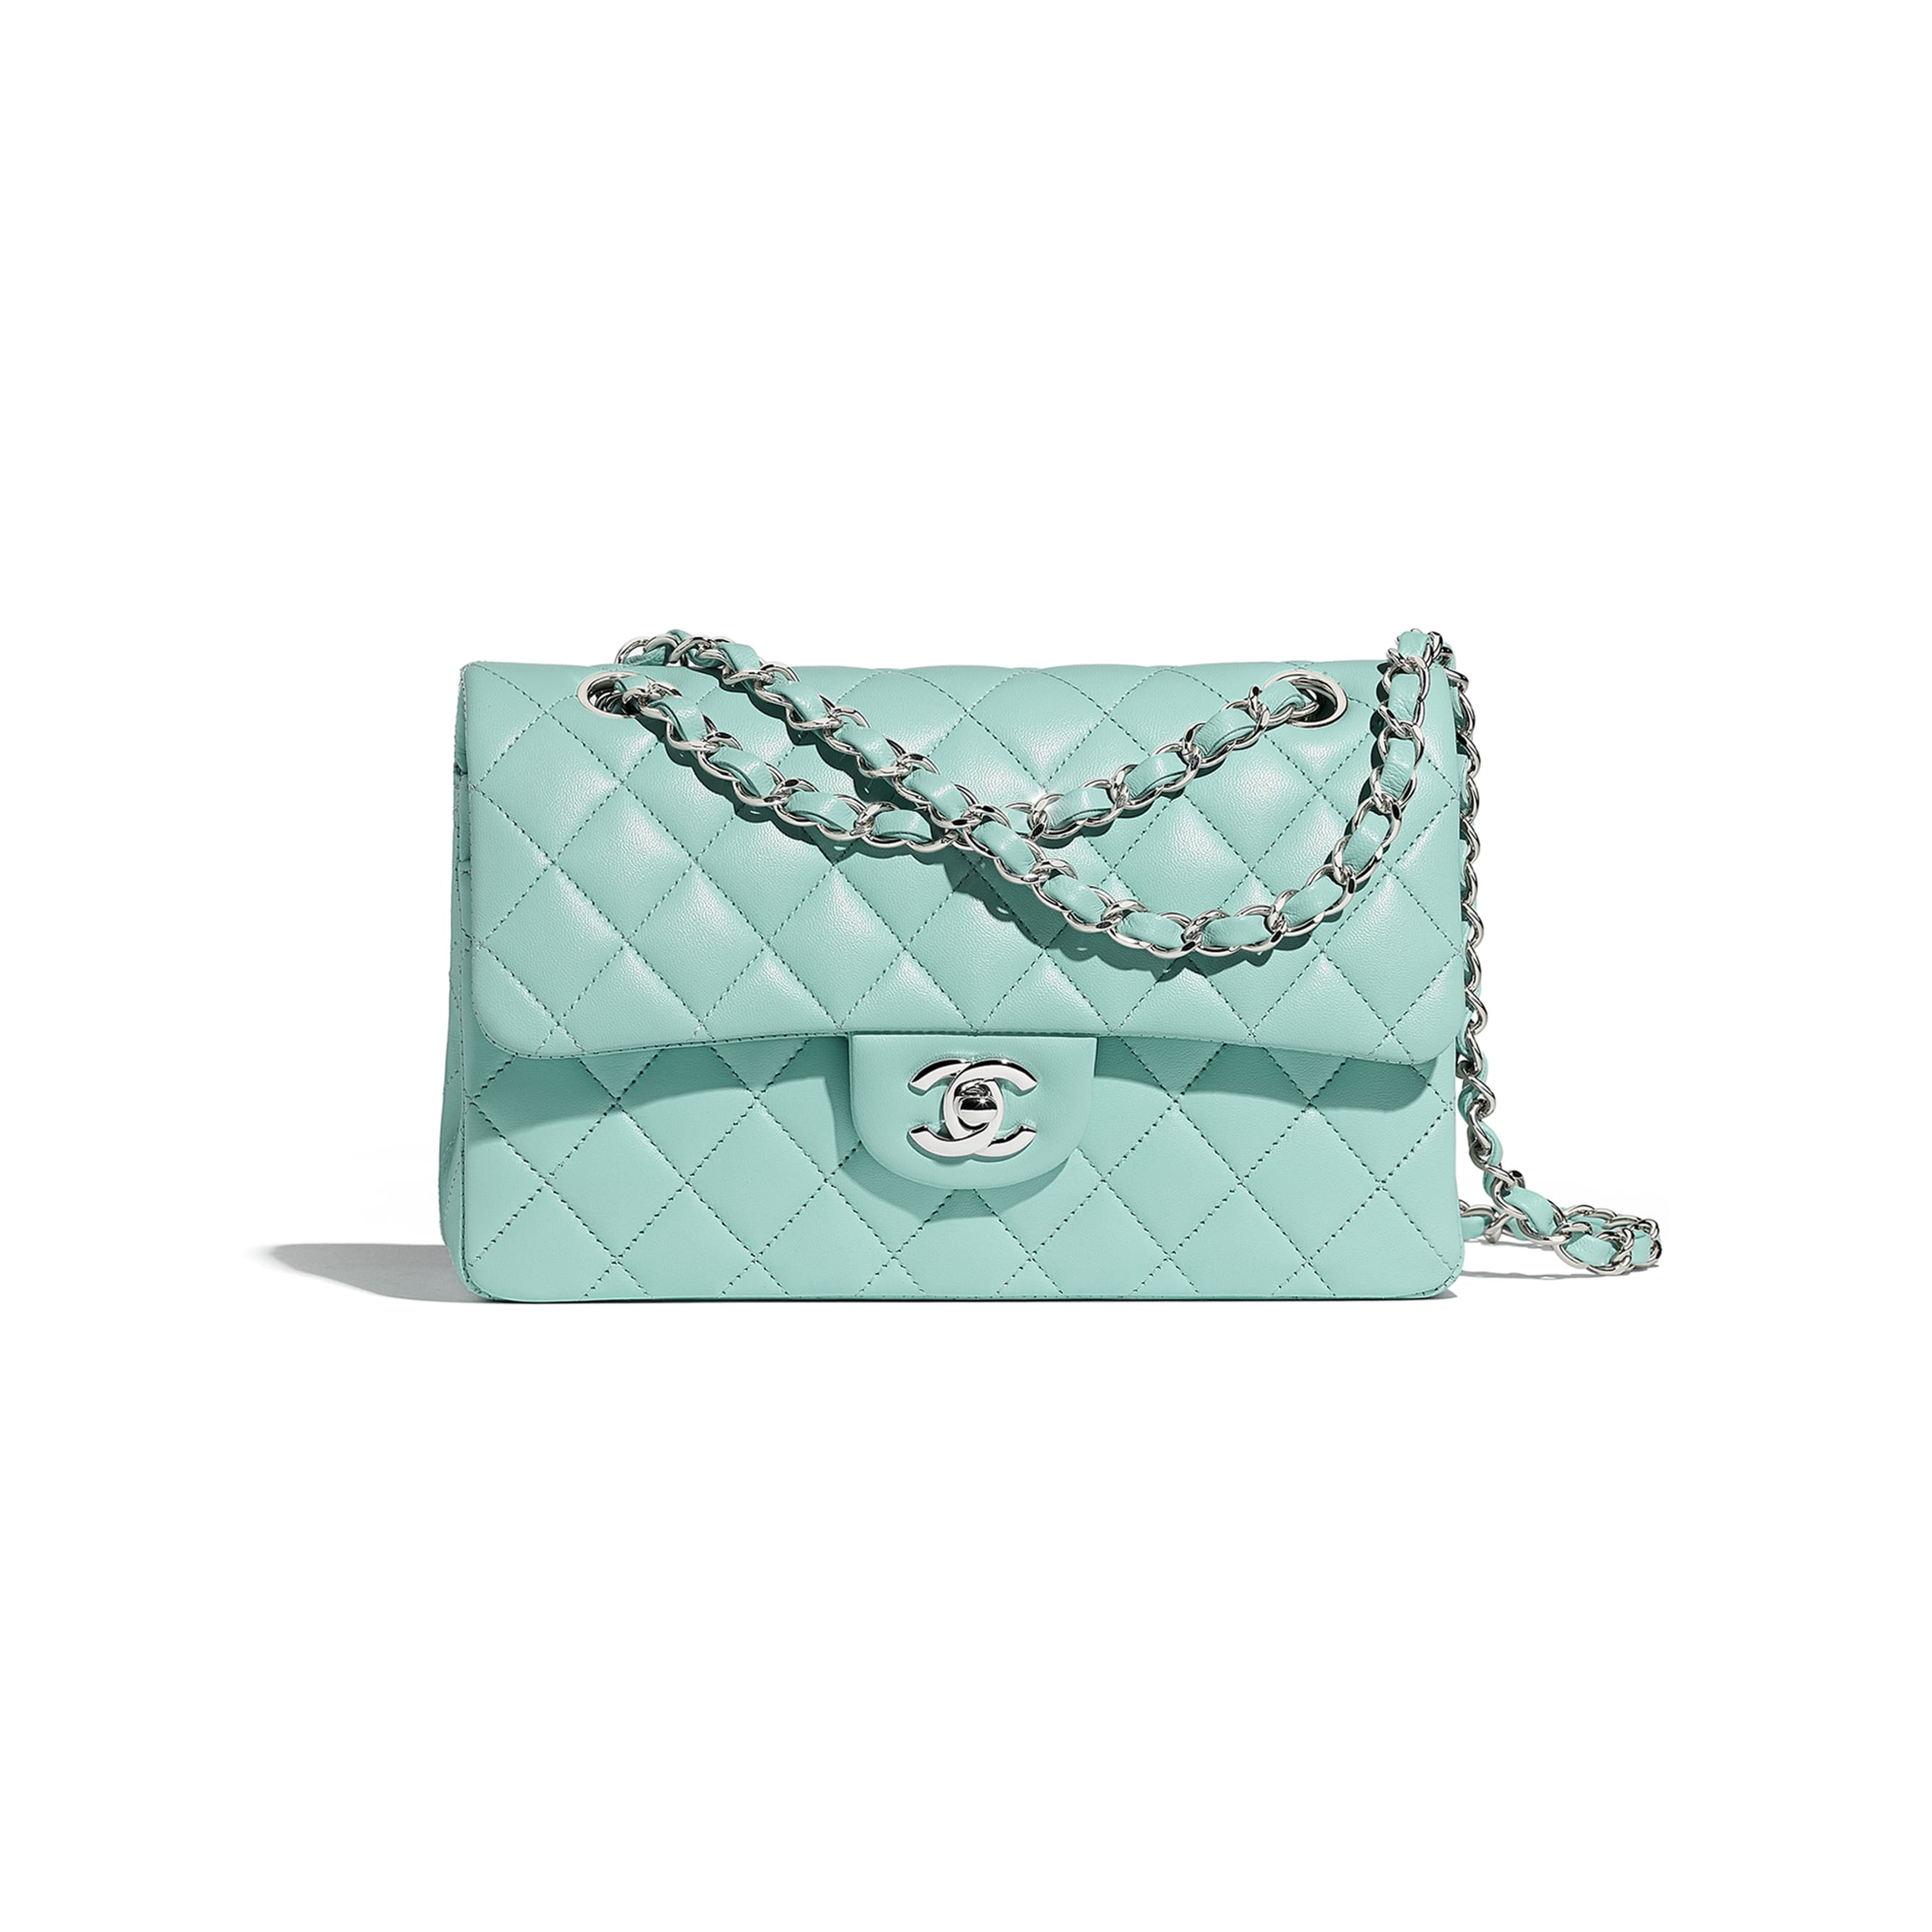 Small Classic Handbag - Light Blue - Lambskin & Silver-Tone Metal - Default view - see standard sized version